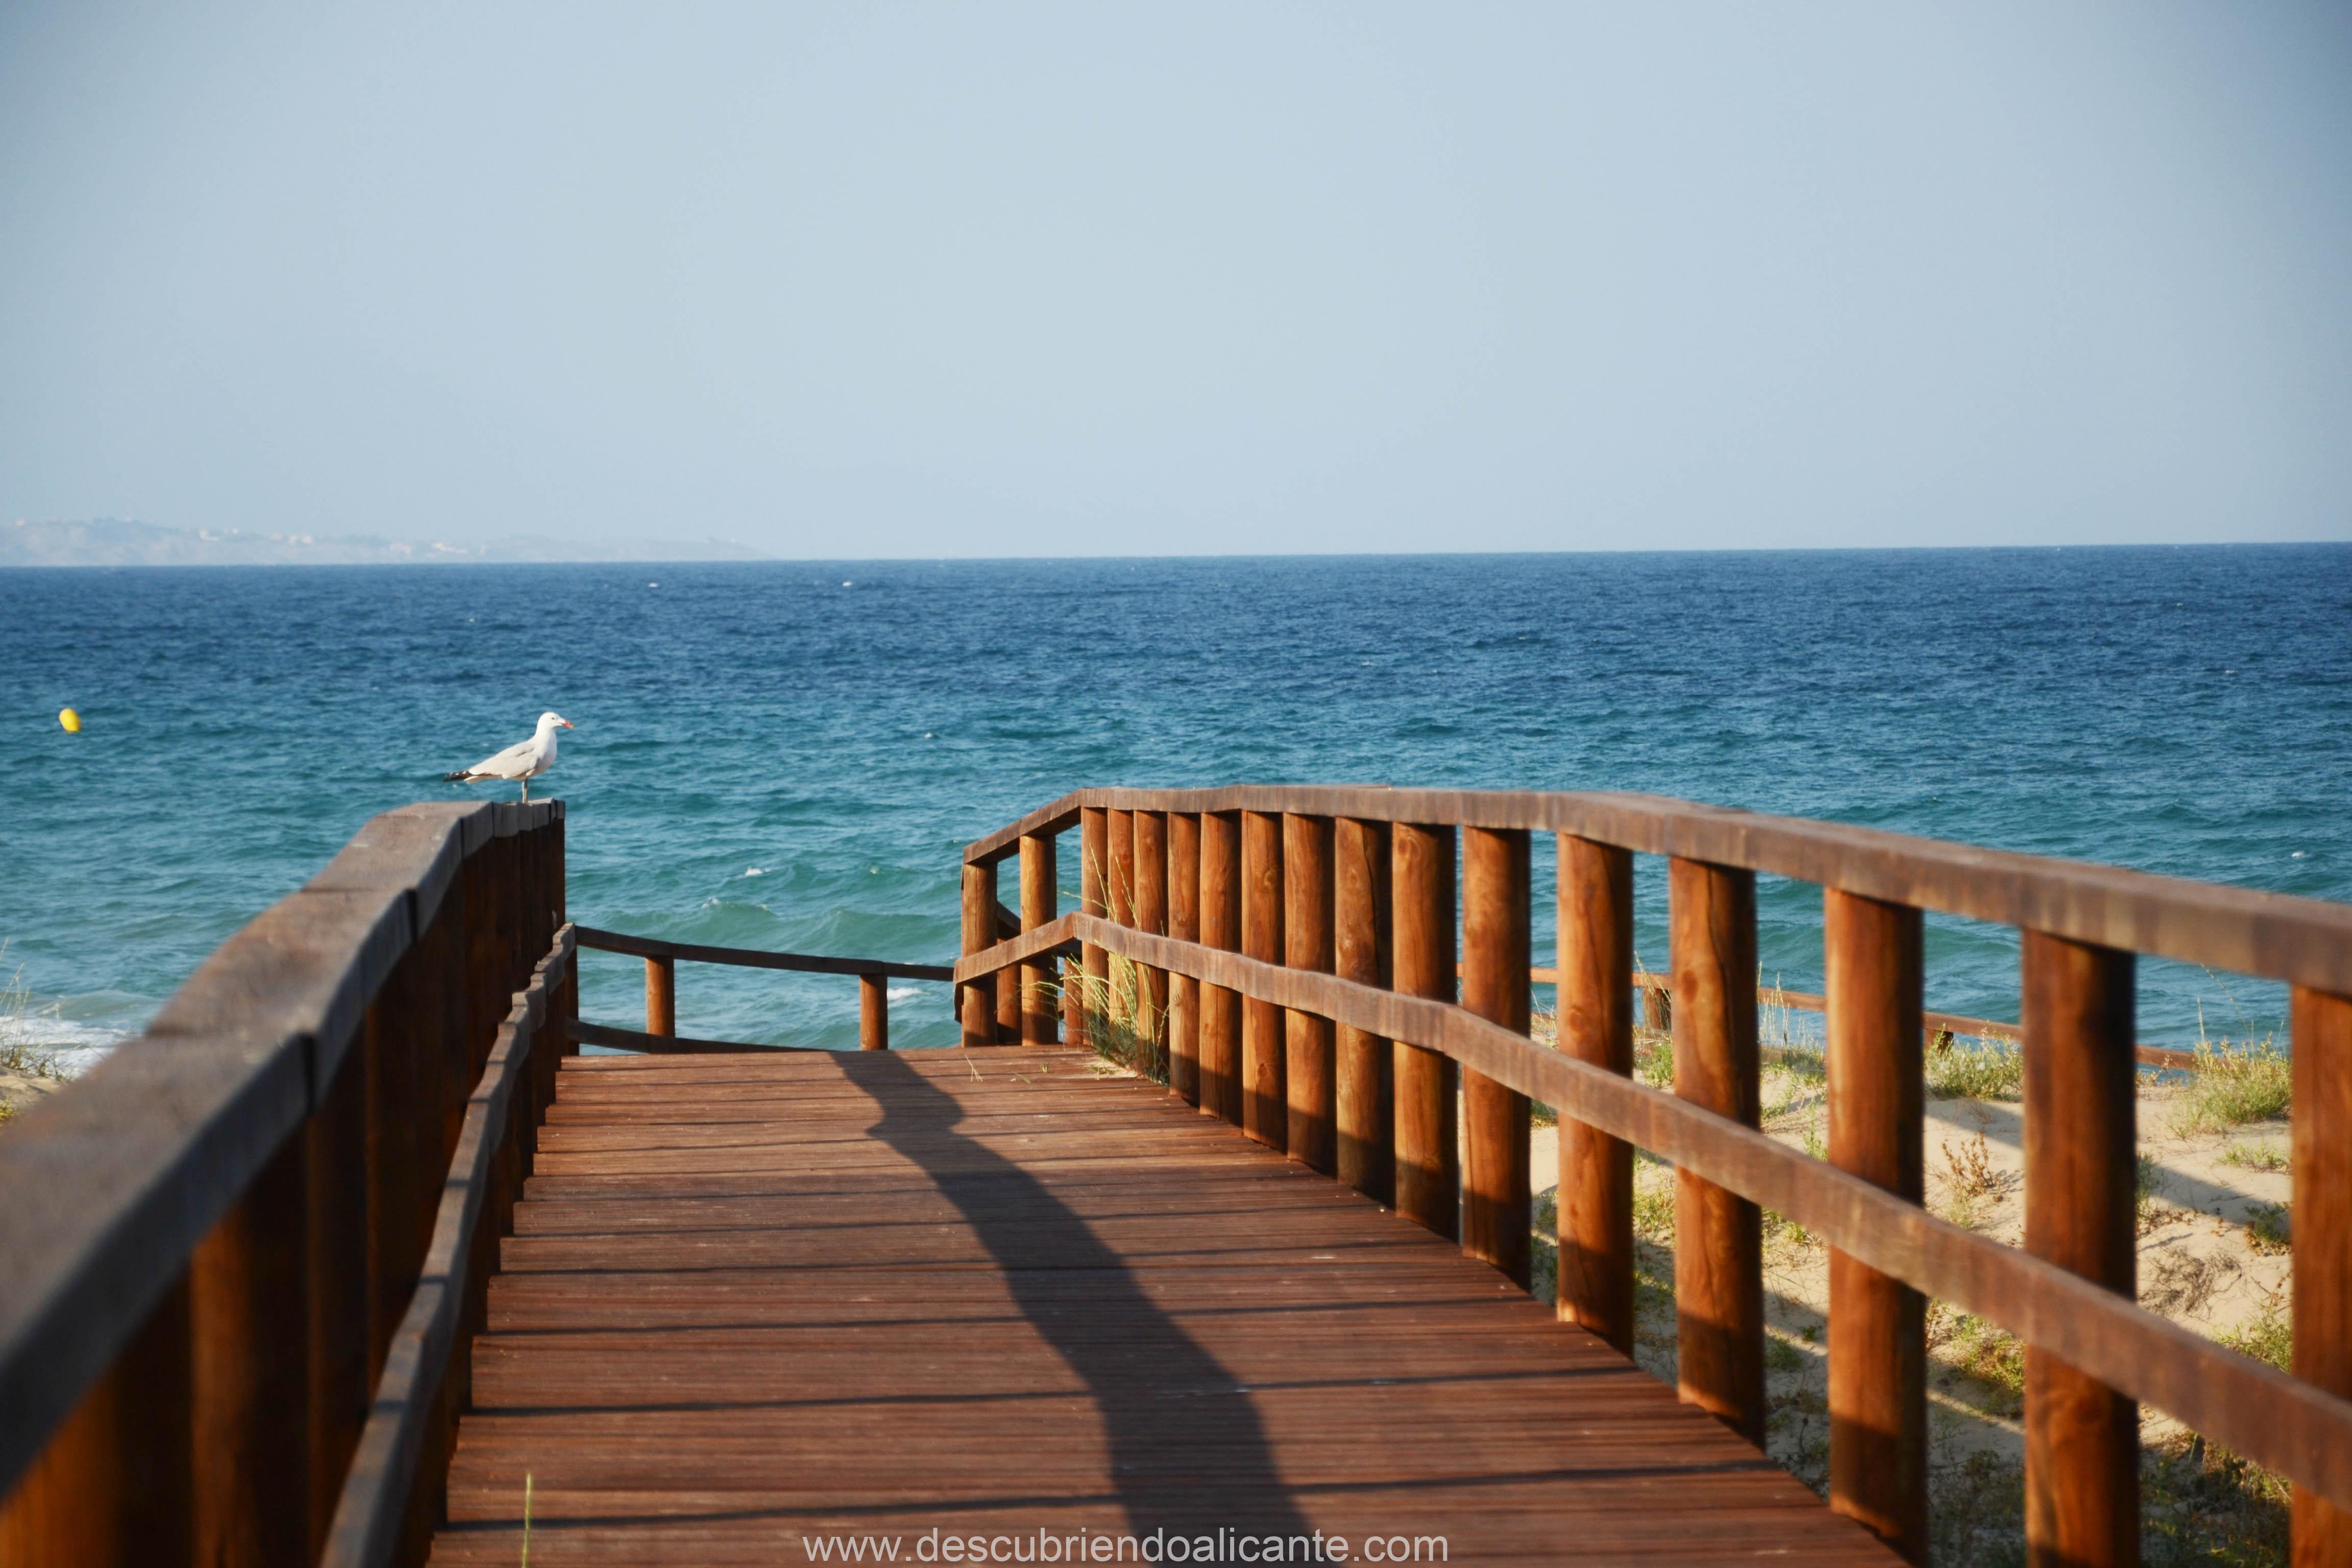 pasarela-de-madera-playa-arenales-elche